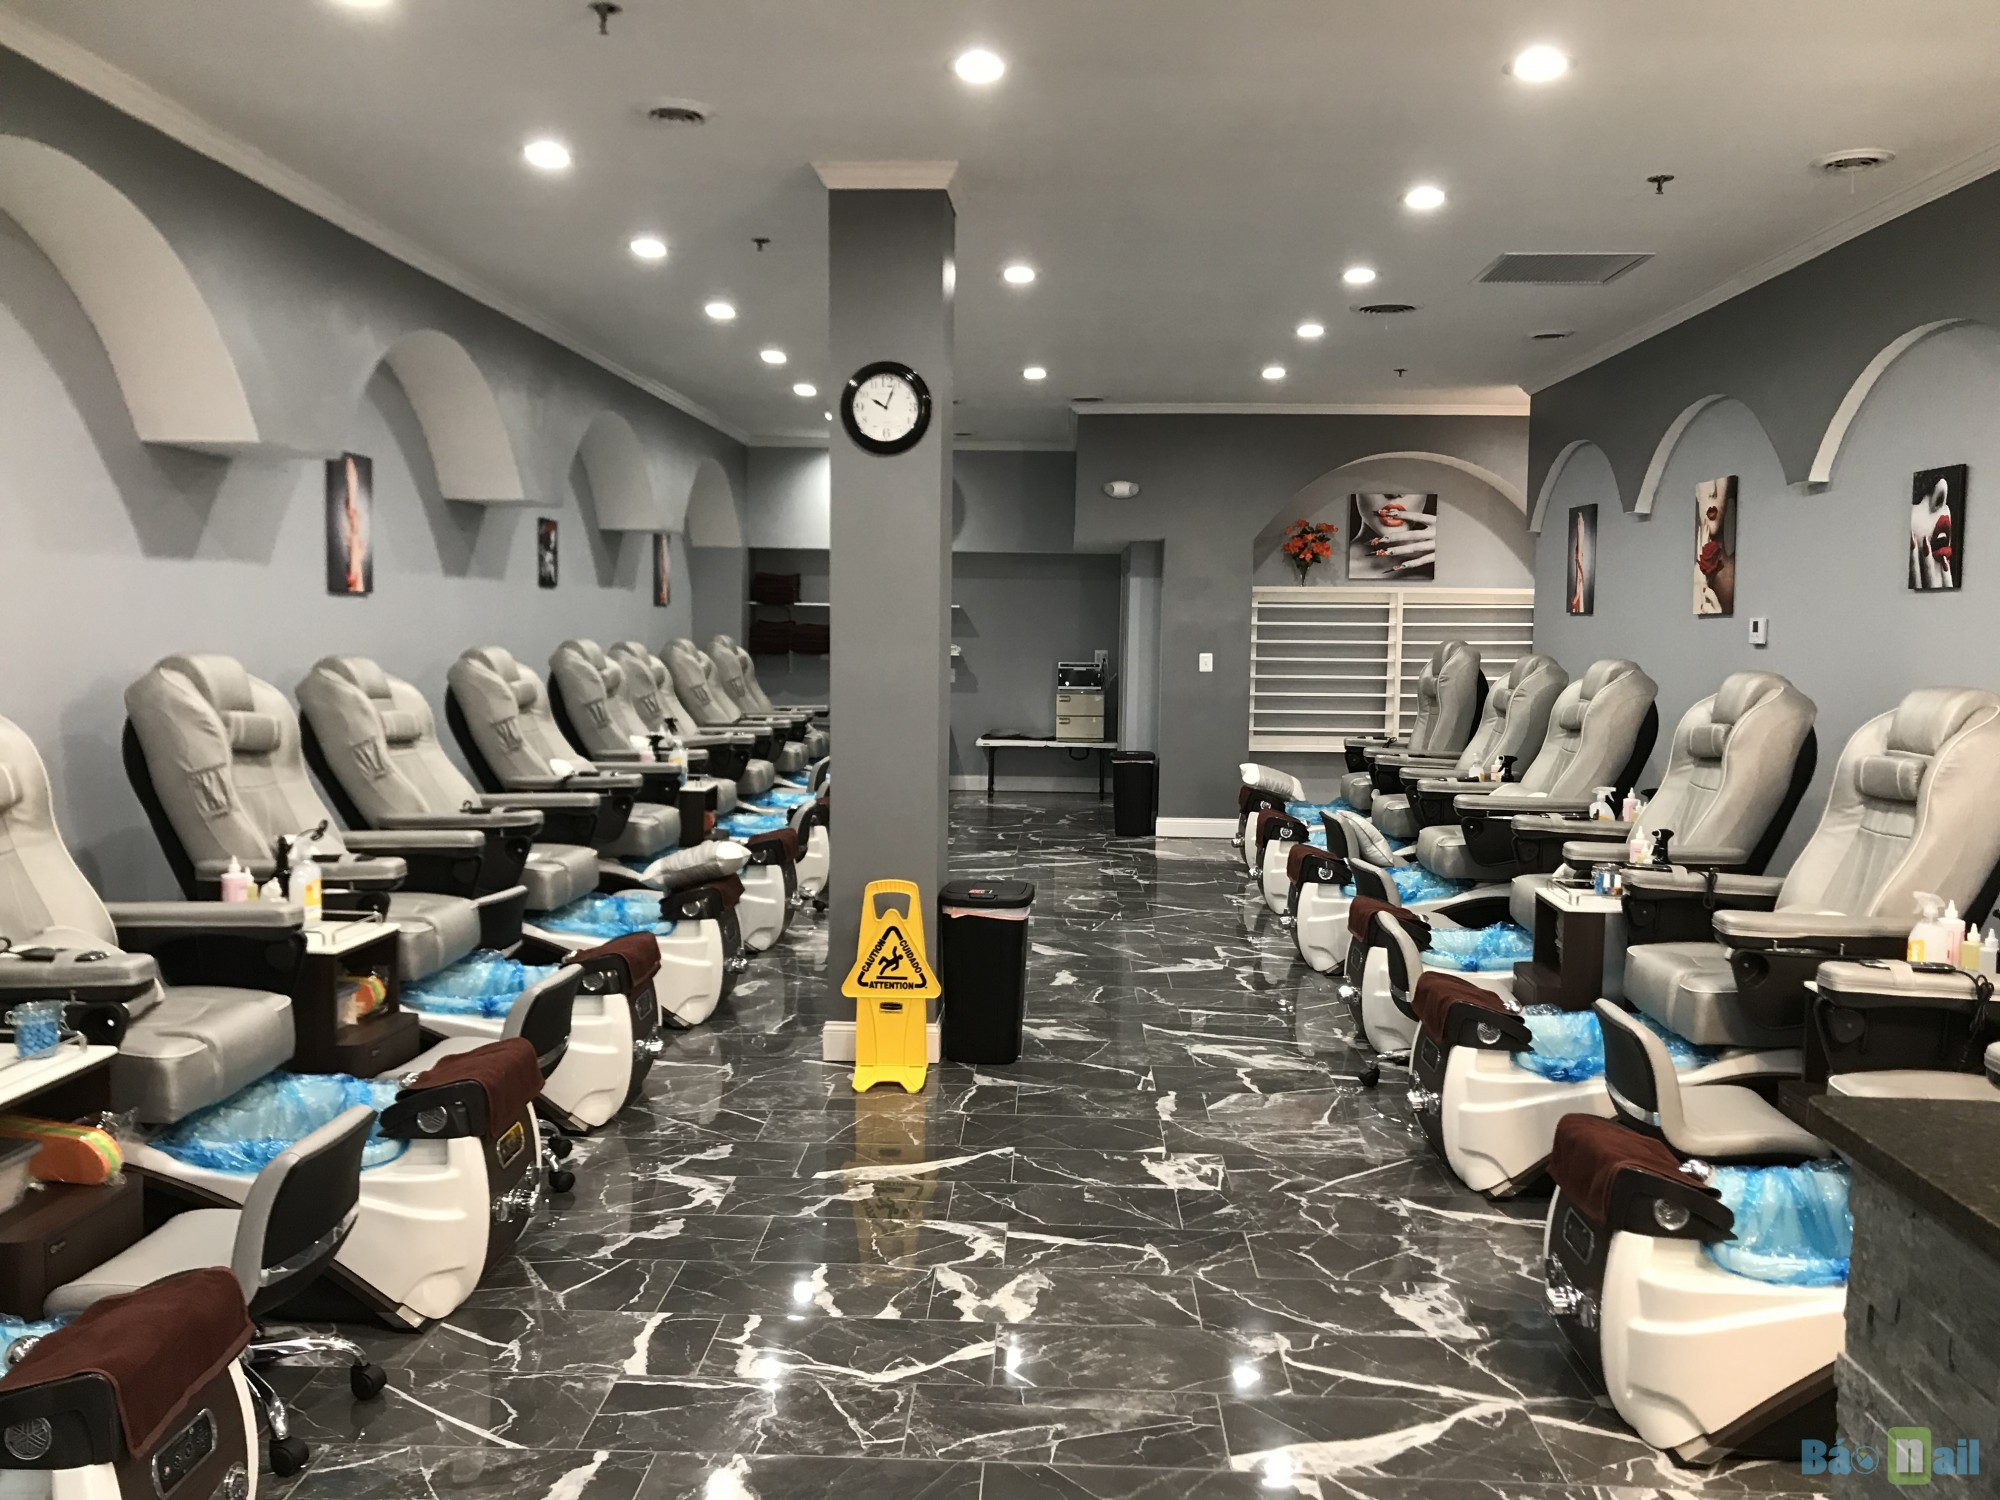 Aj Nails & Spa, Mentor OH   New New New Cần nhiều thợ nails